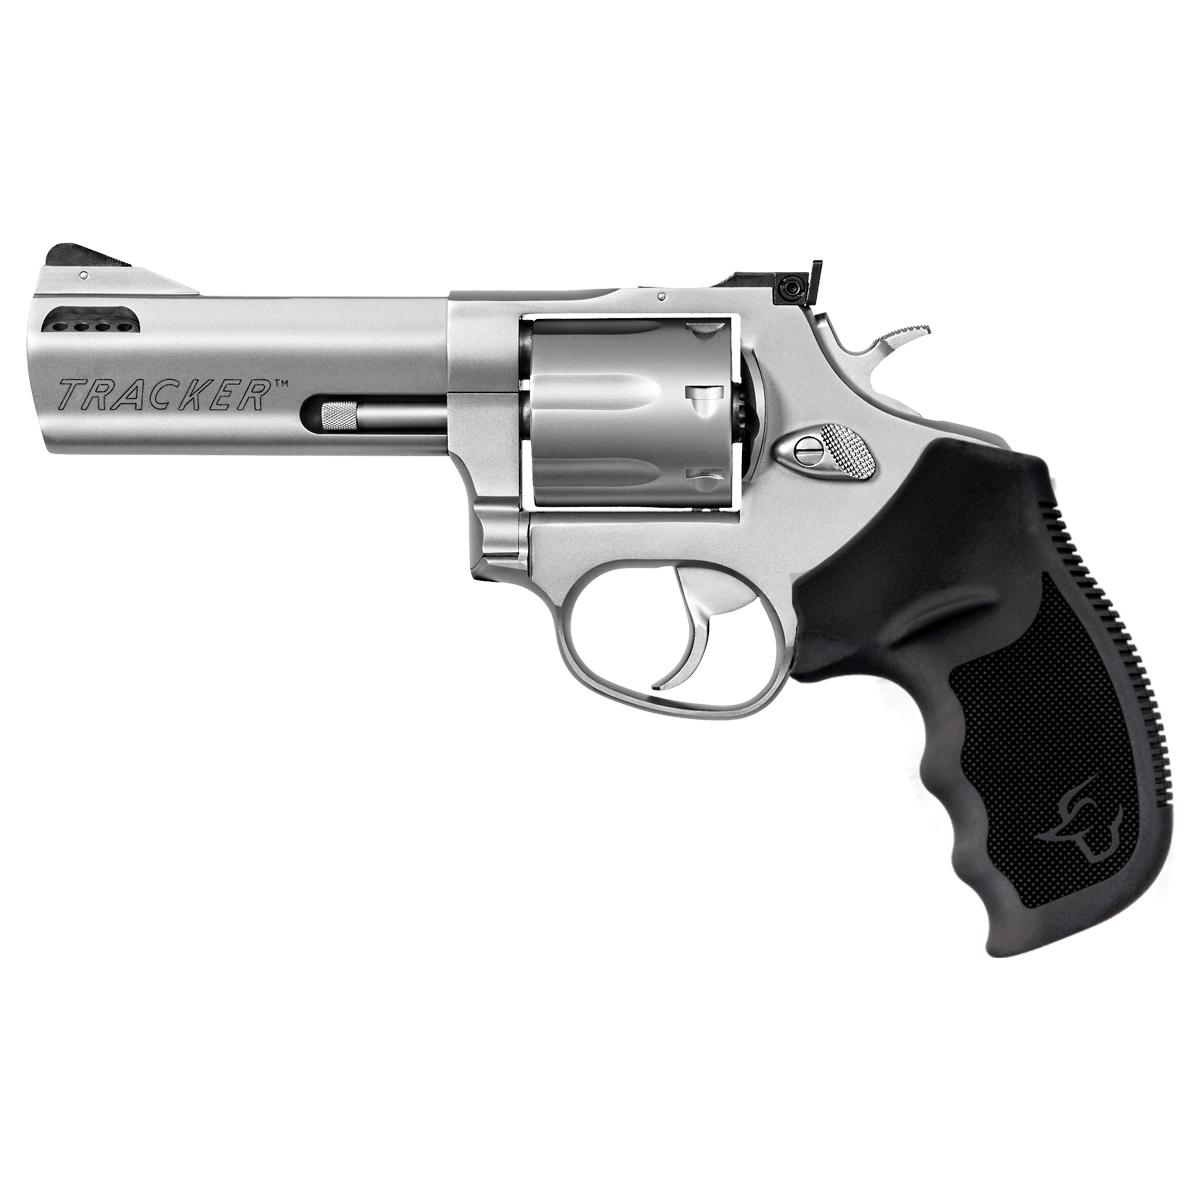 "Revolver TAURUS 627 TRACKER 4"" NEW GENERATION Cal 357 mag"